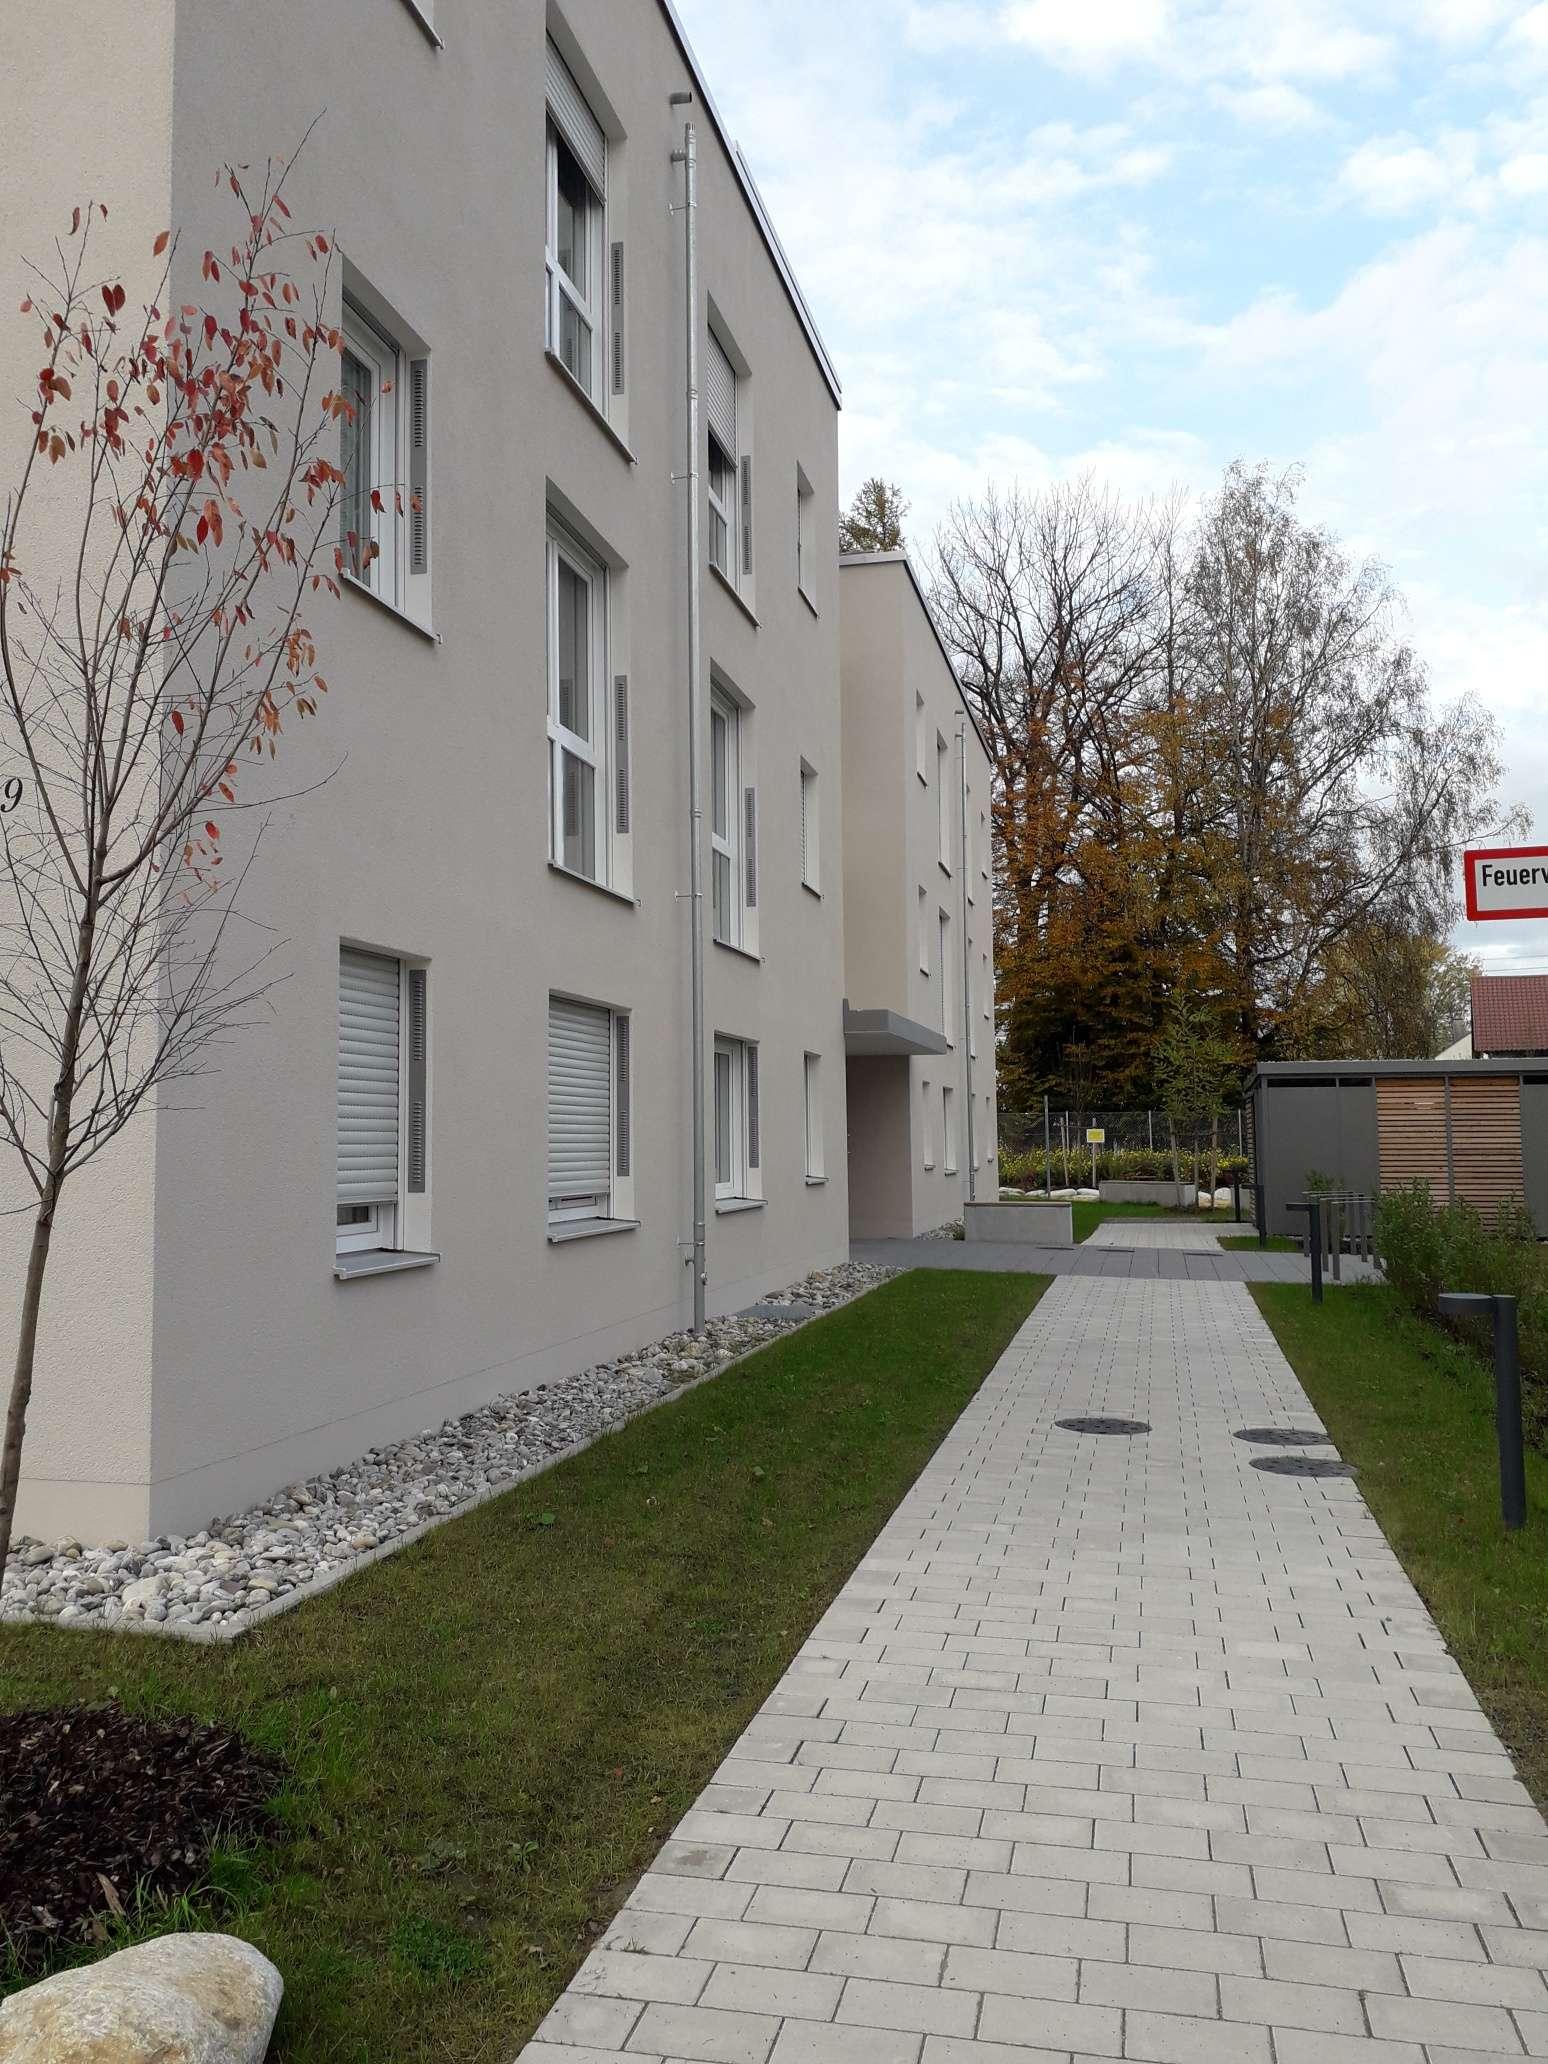 Schöne großzügige Wohnungen in Neusäß - Nähe Uniklinik in Neusäß